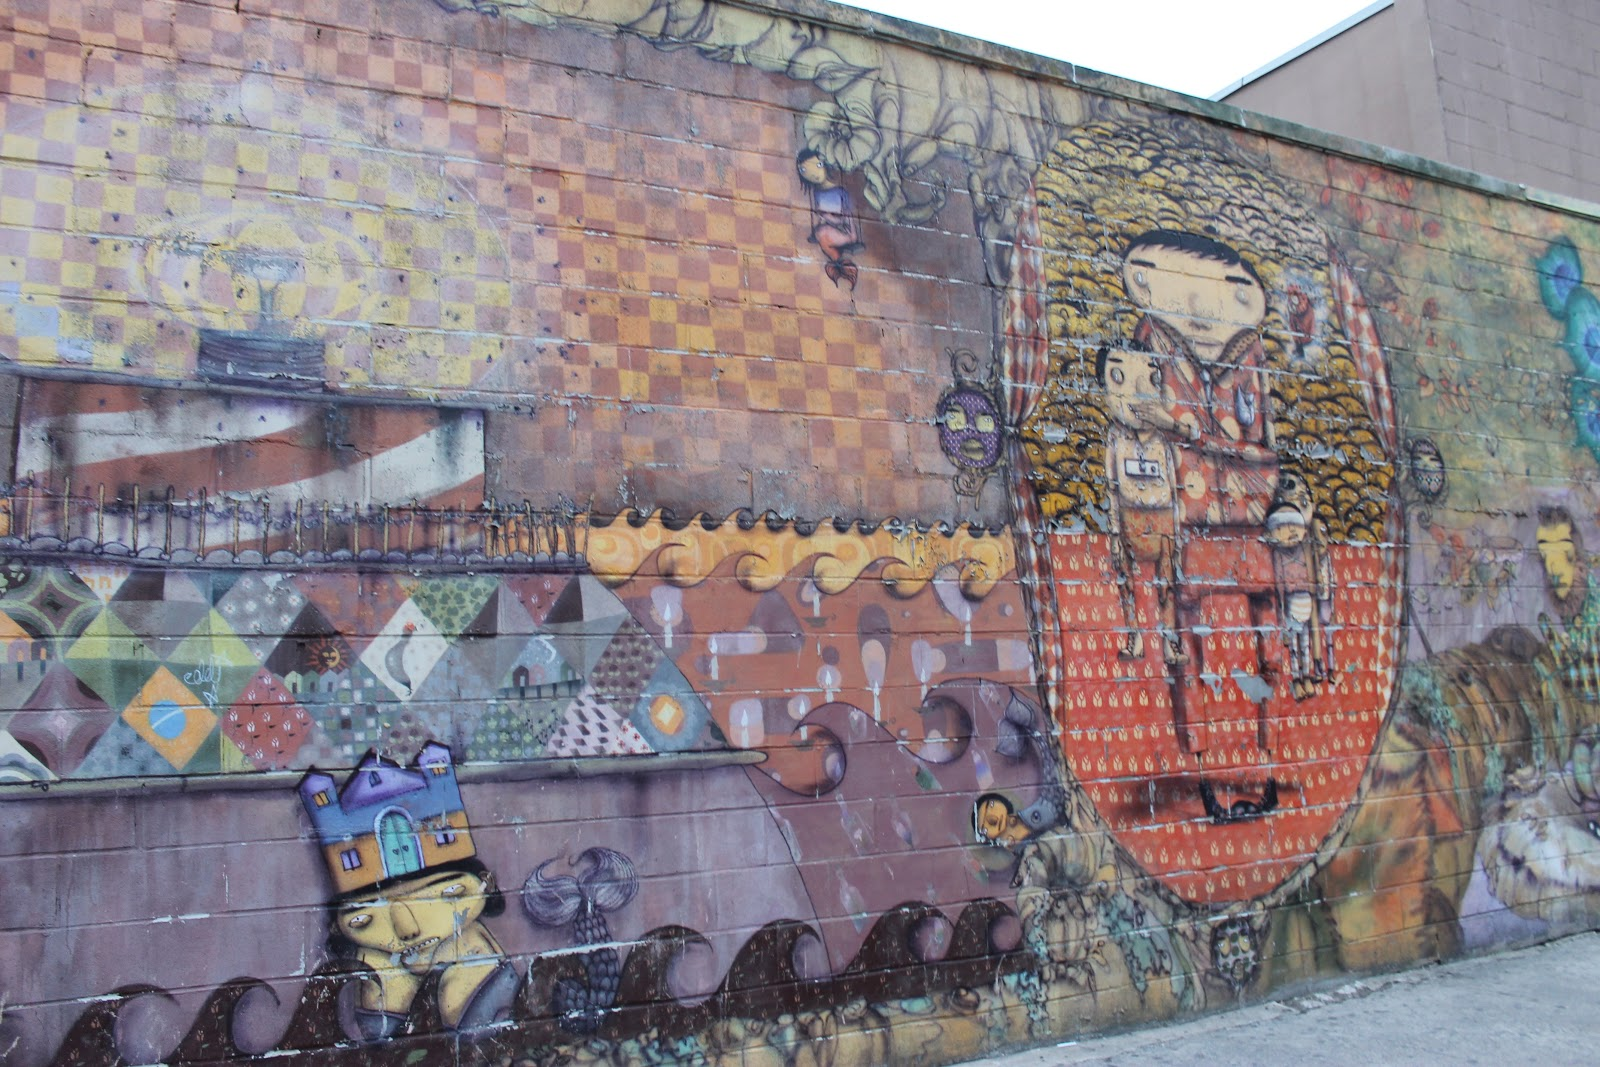 Graffiti brains os gemeos mural coney island for Coney island mural